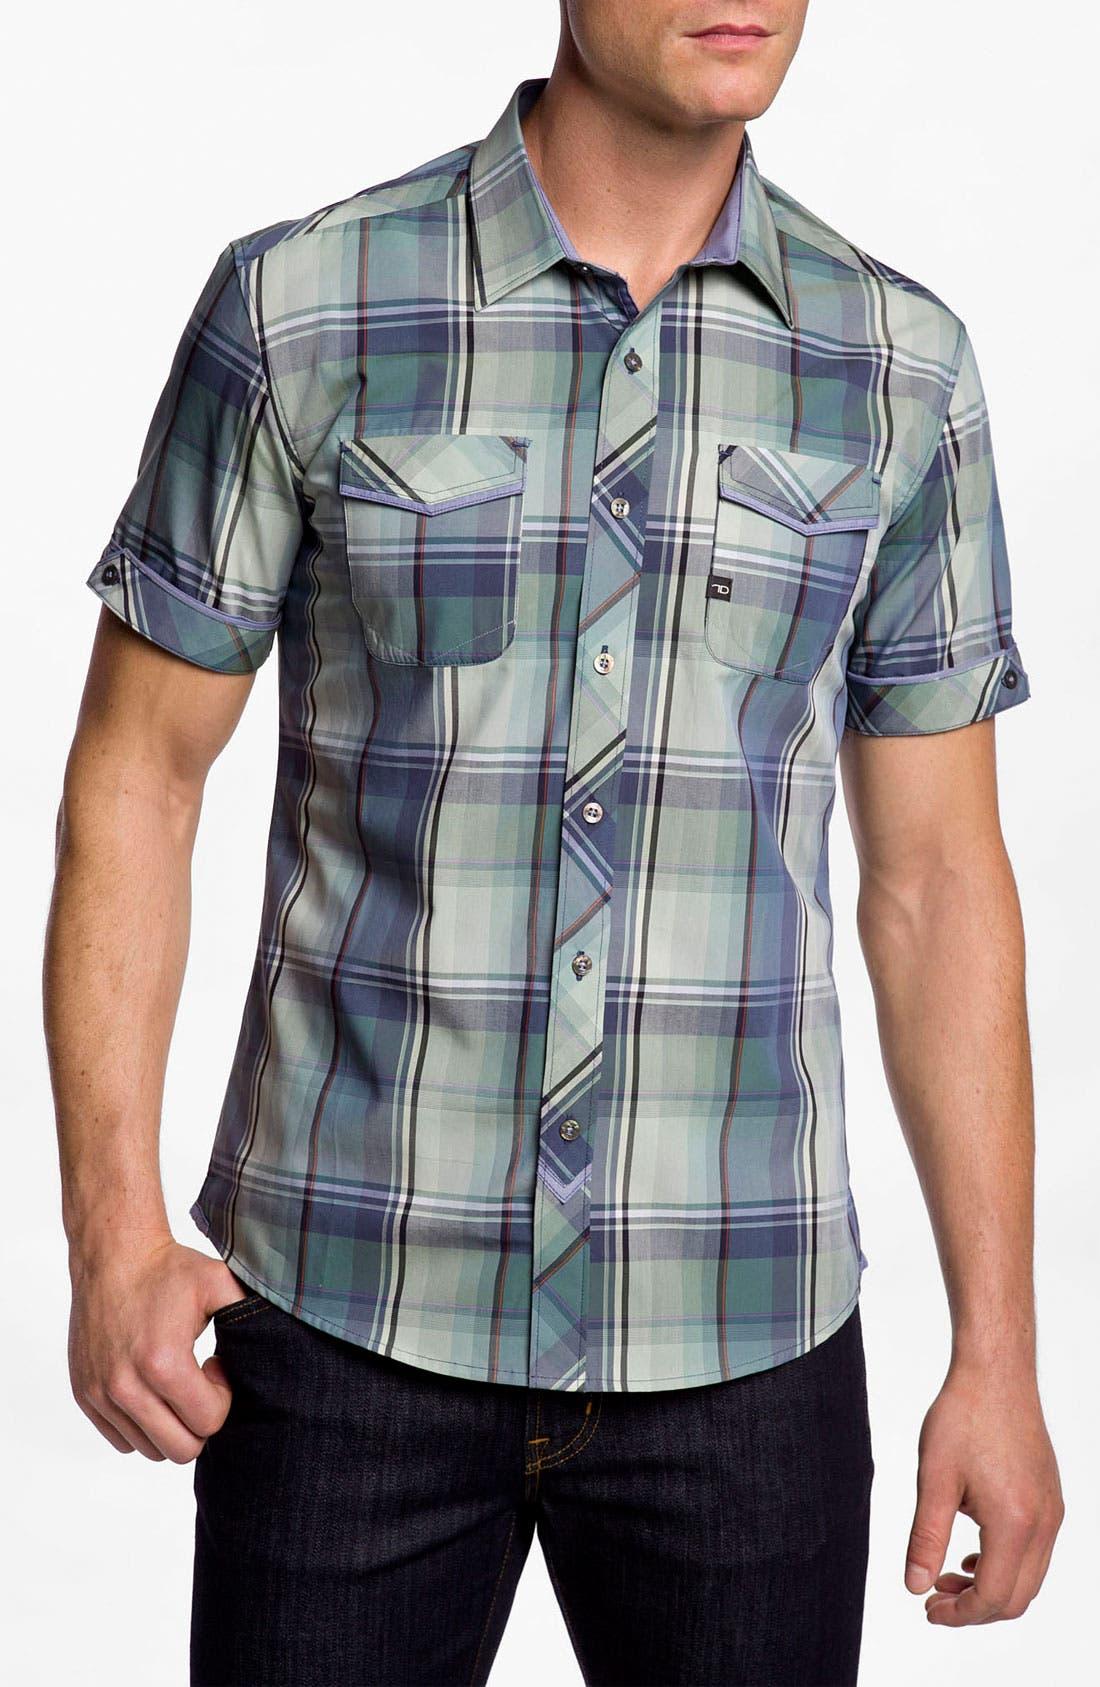 Alternate Image 1 Selected - 7 Diamonds 'Green Eyed Love' Plaid Woven Short Sleeve Shirt